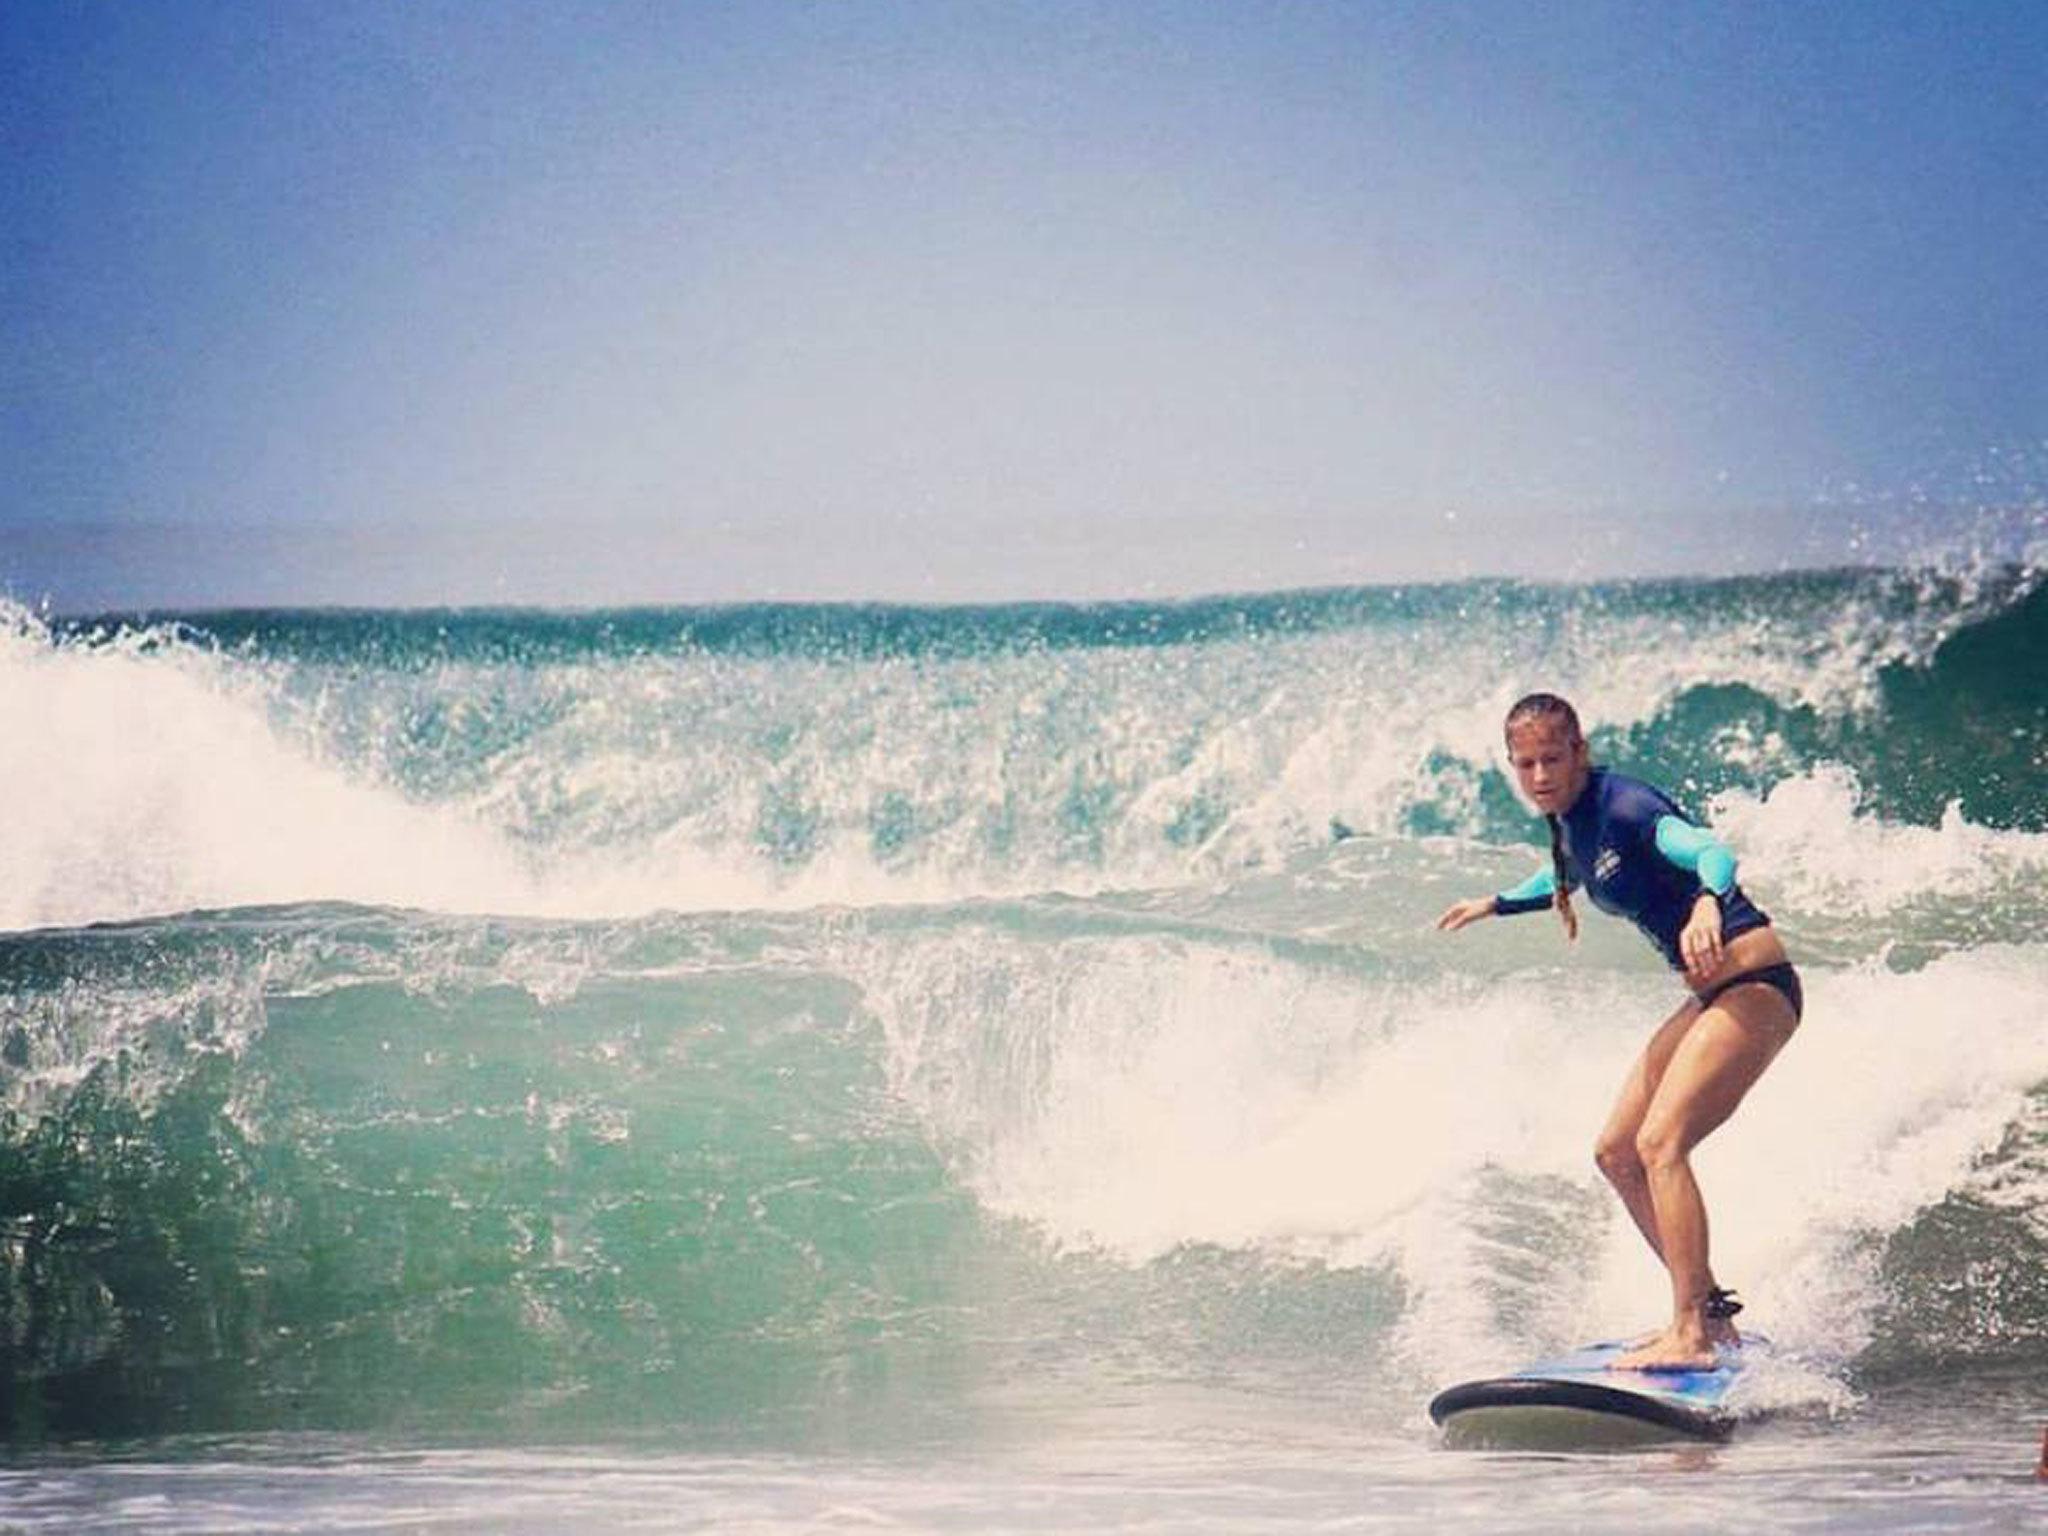 Santai Surf School - Seminyak - Indonesia